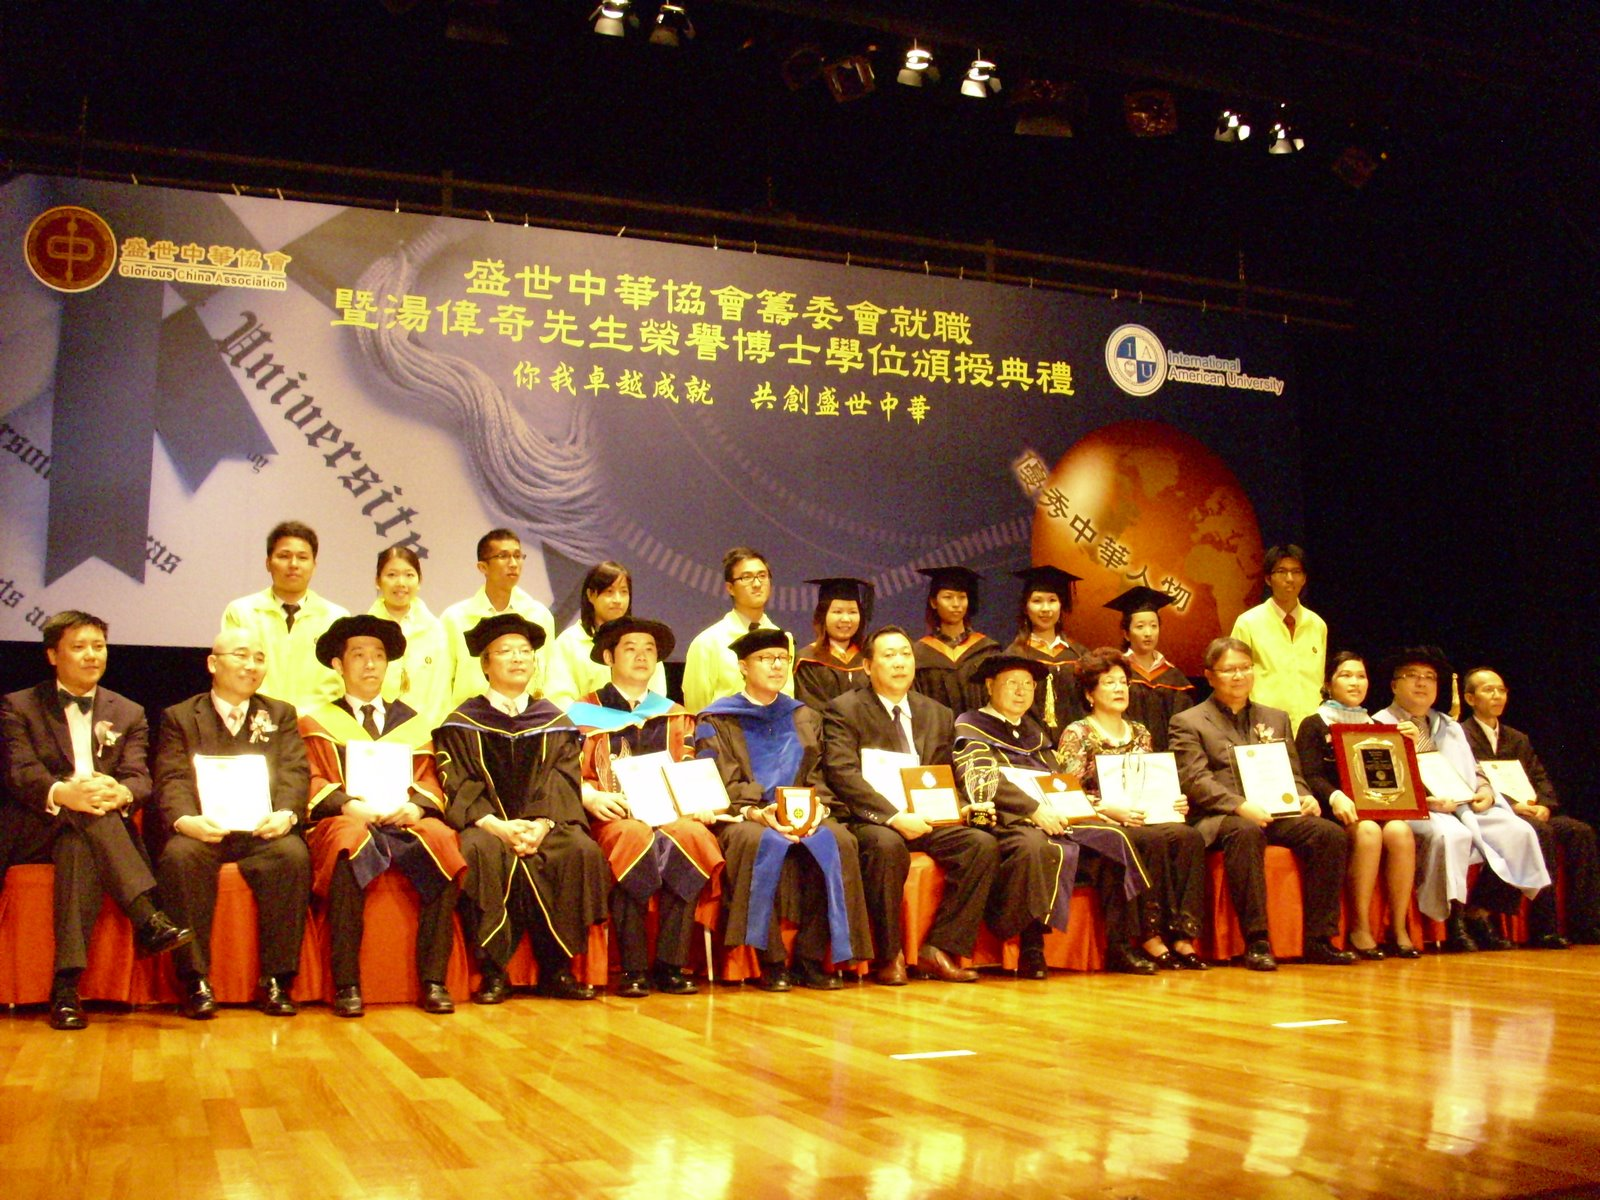 IAU and Glorious China Association celebration.盛世中華協會與美國國際大學博士學位典禮